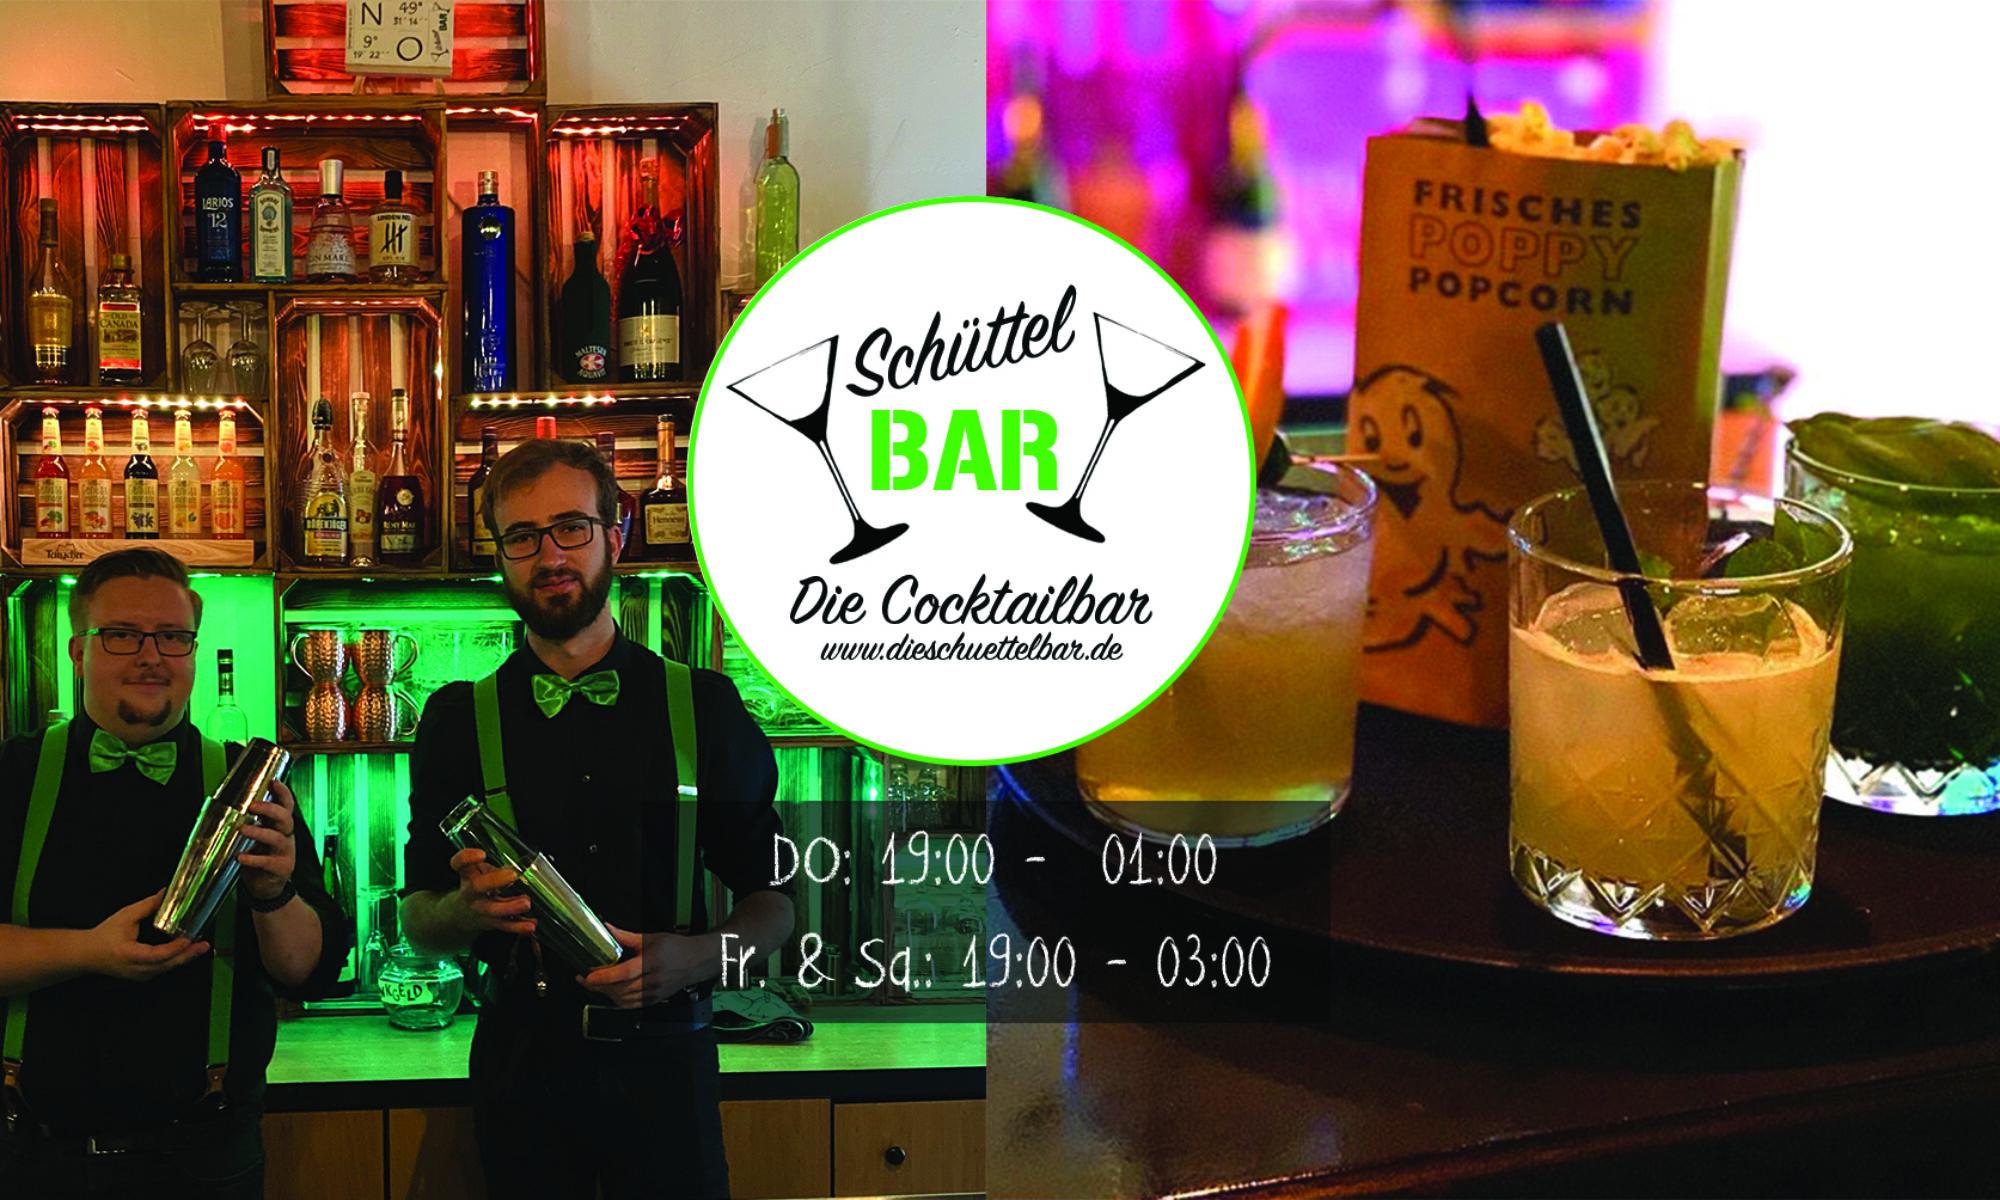 Die Schüttelbar - Cocktailbar